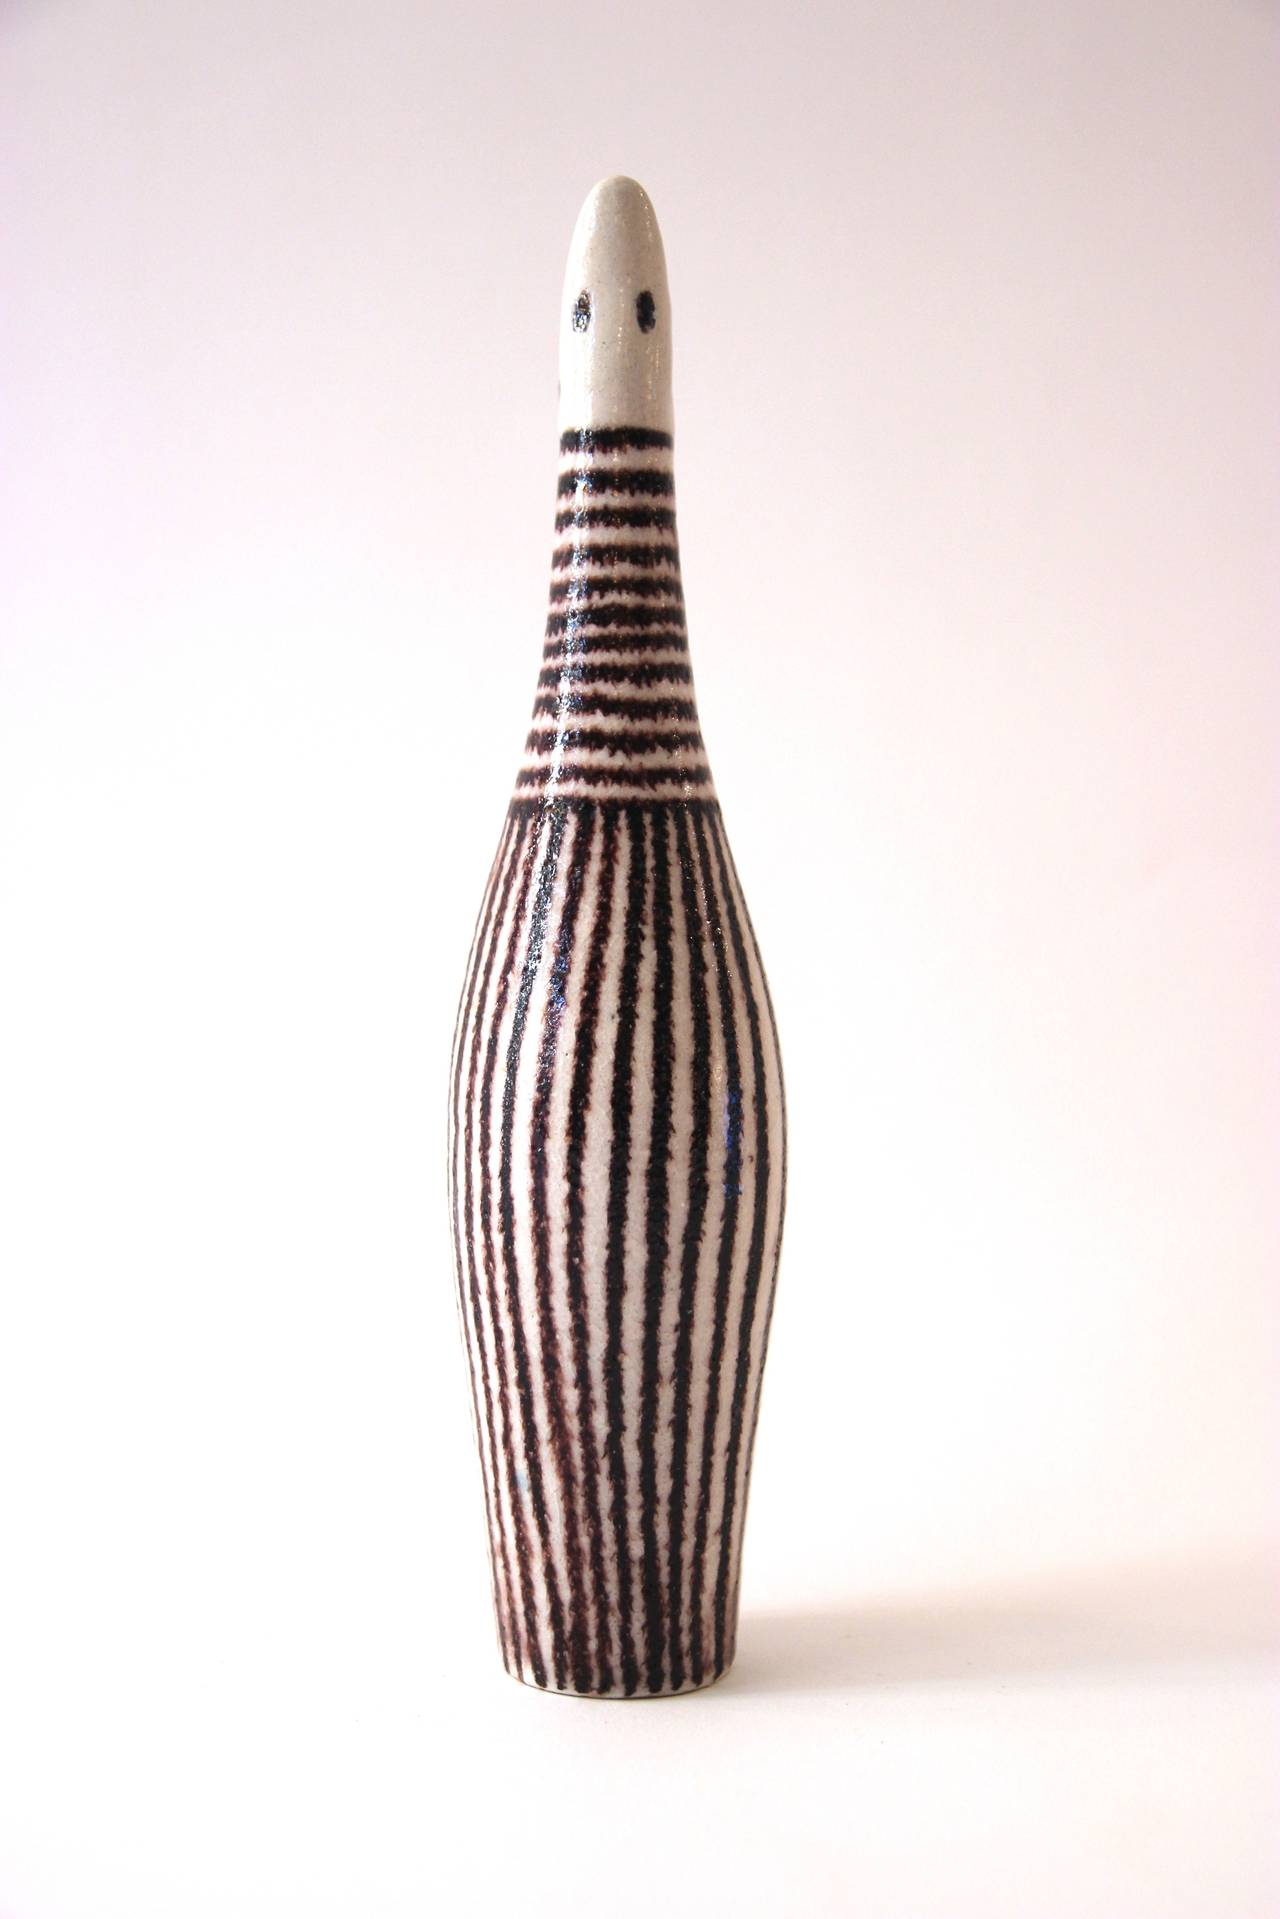 Italian Guido Gambone Signed Ceramic Bottle, Italy, circa 1960 For Sale